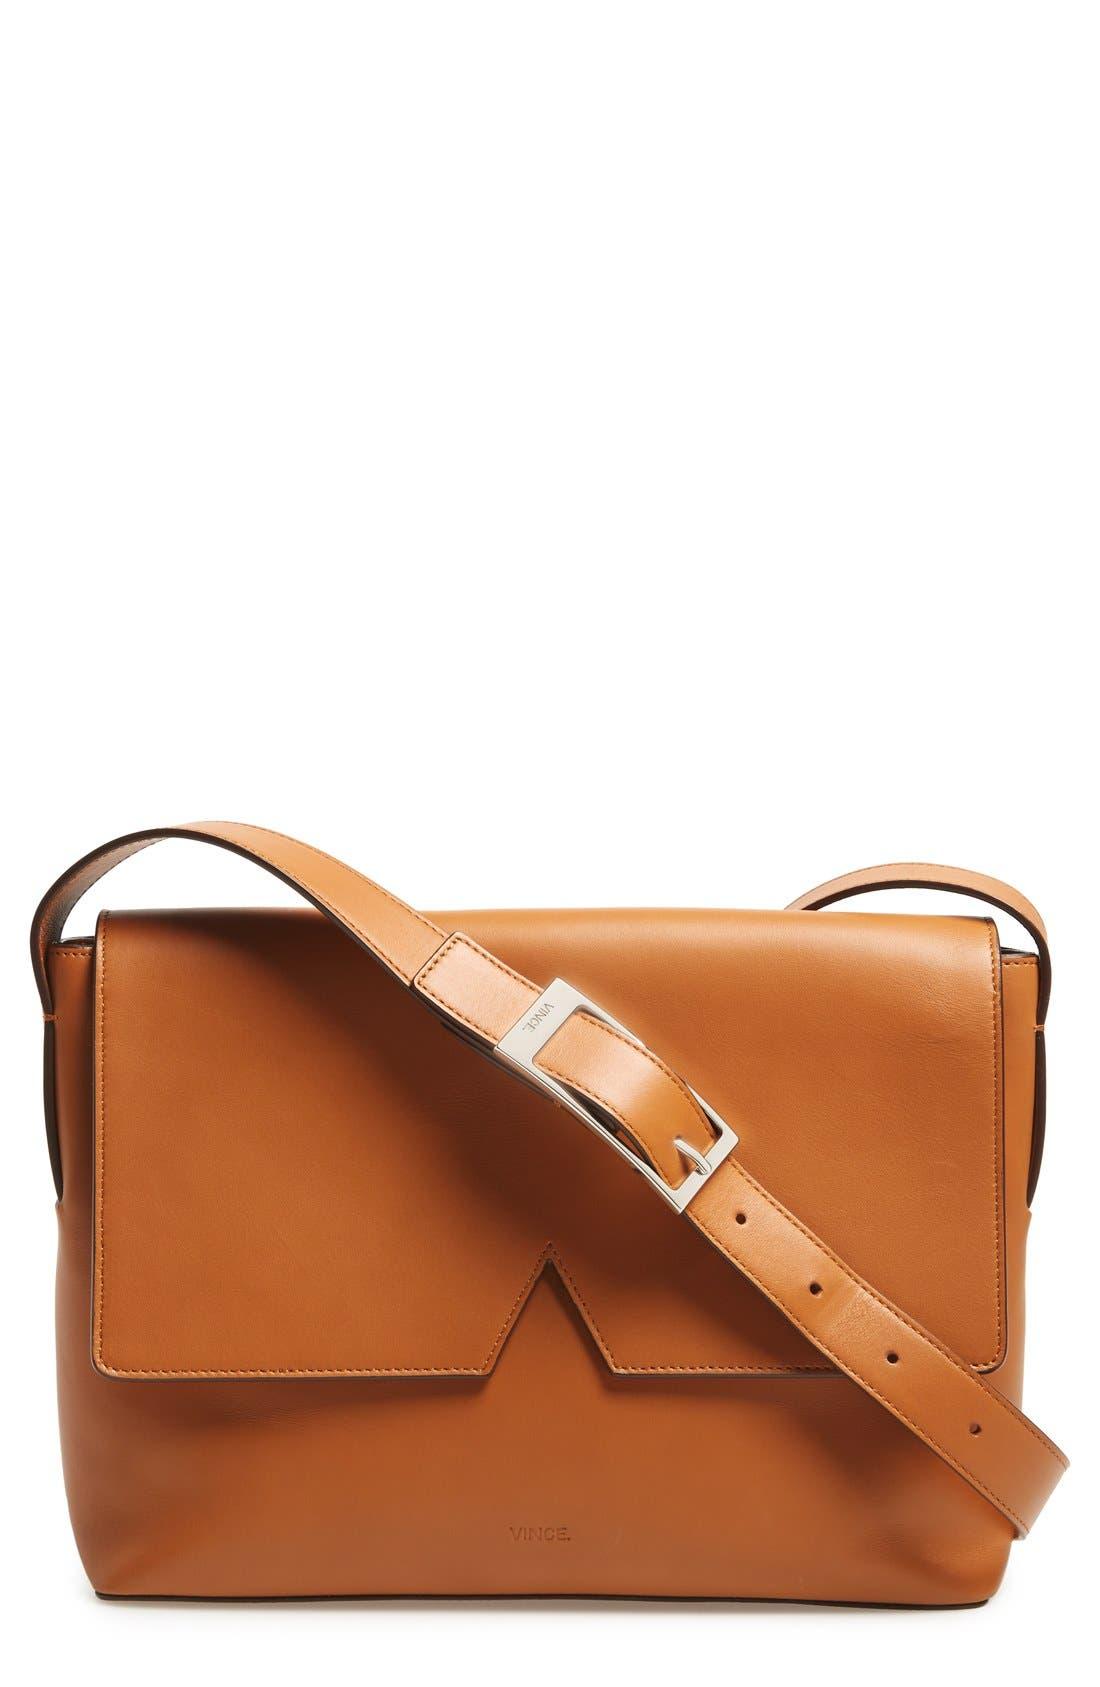 Main Image - Vince 'Signature Collection - Medium' Leather Messenger Bag